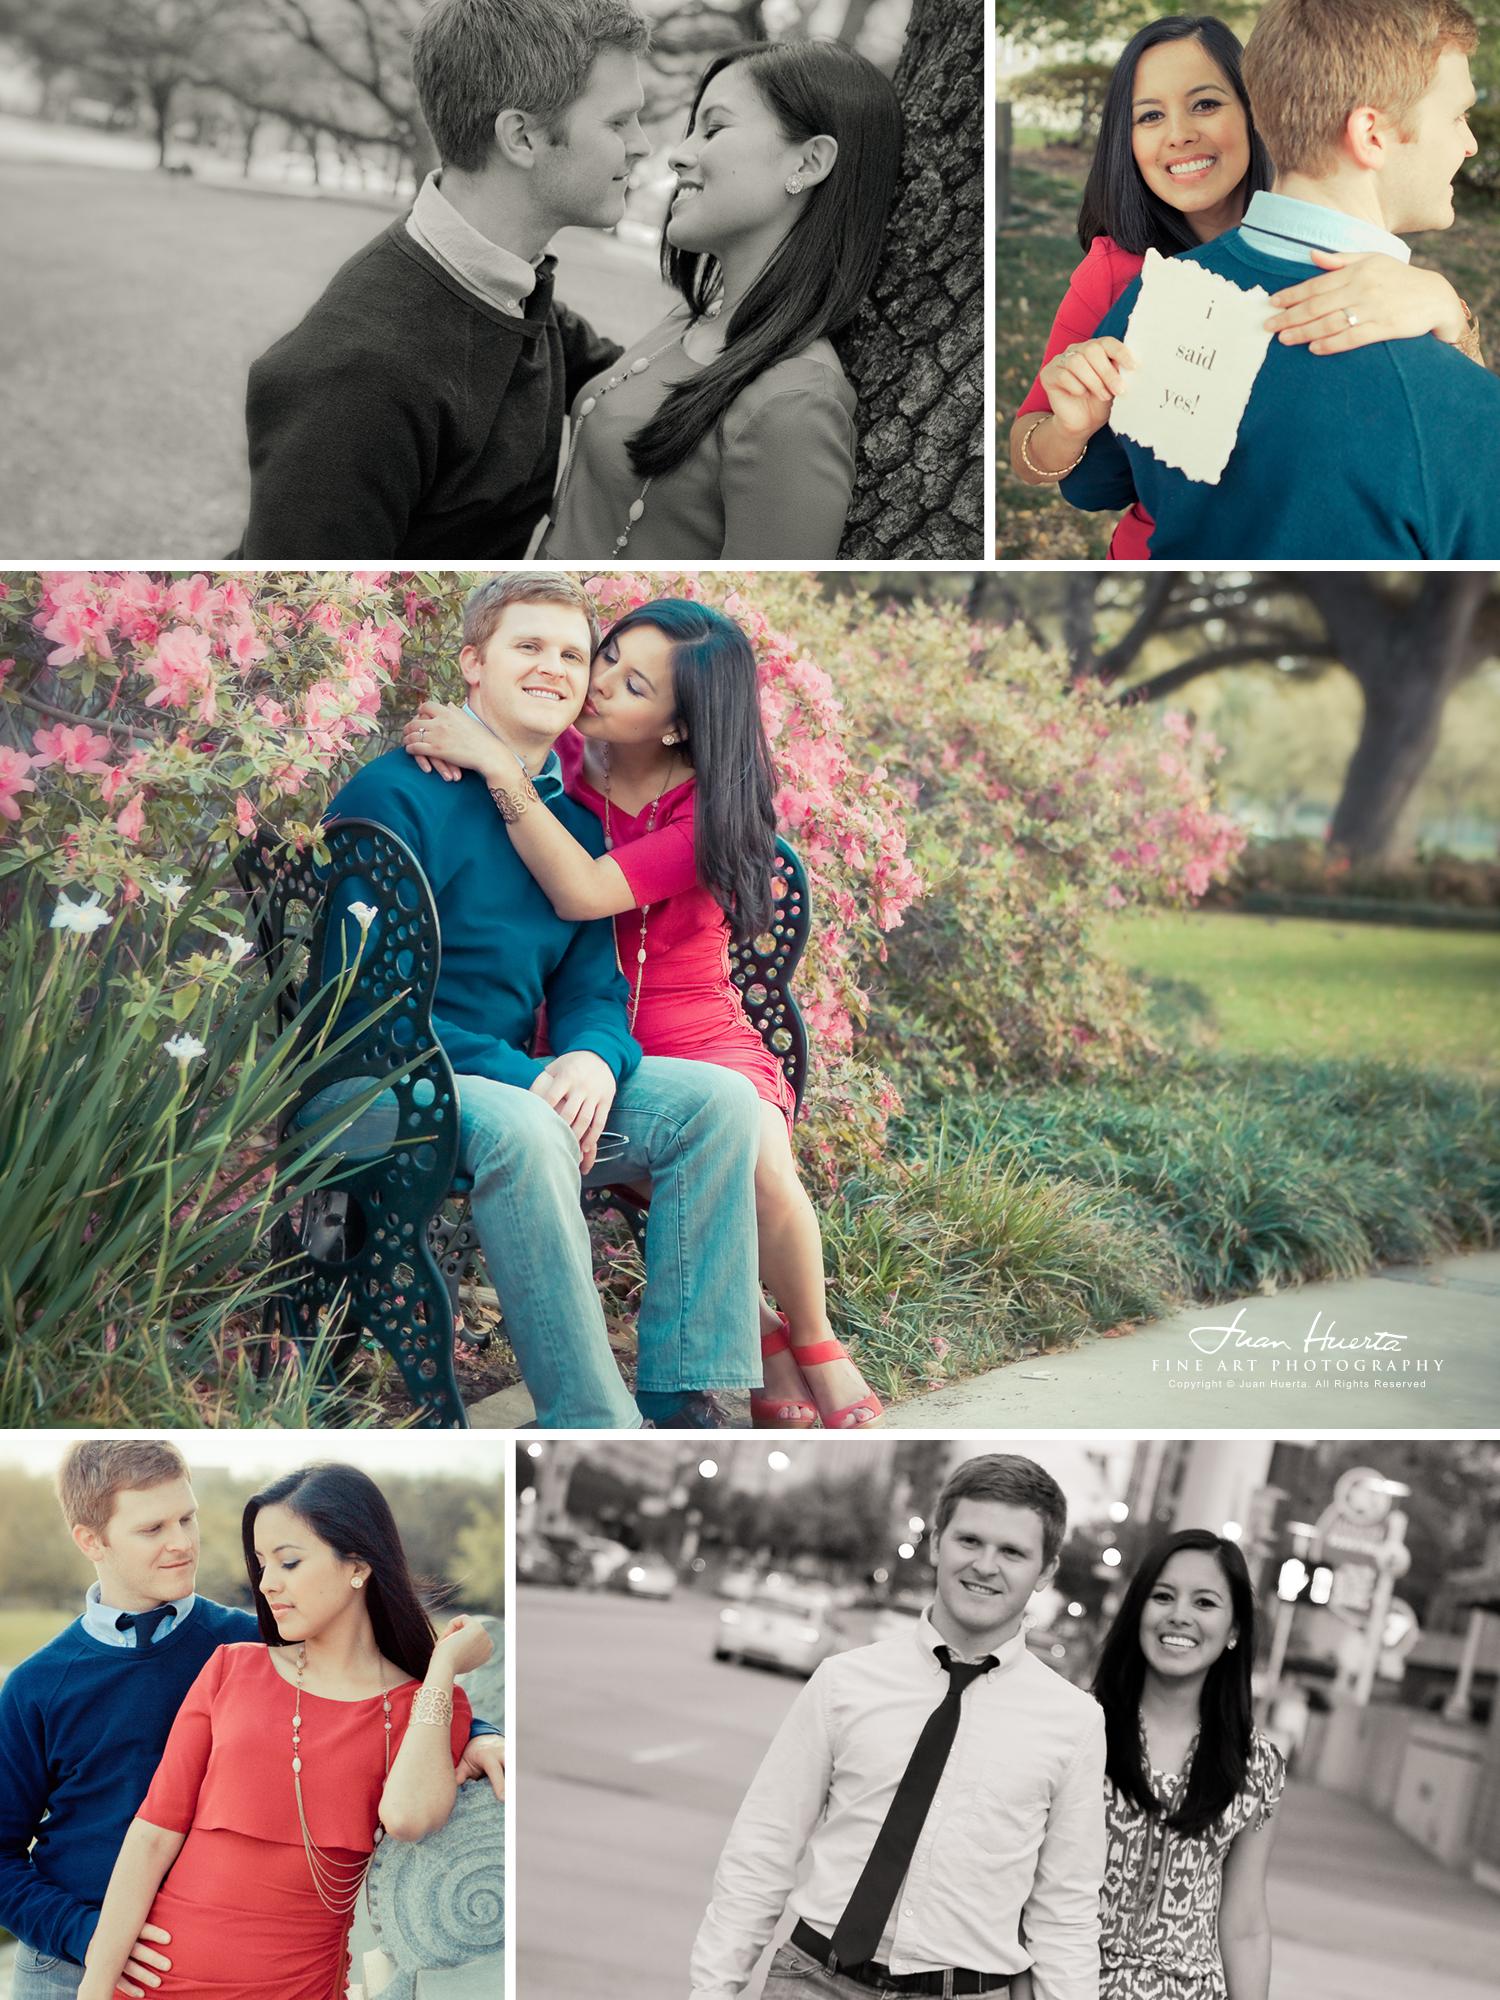 Houston Wedding Photography by Juan Huerta